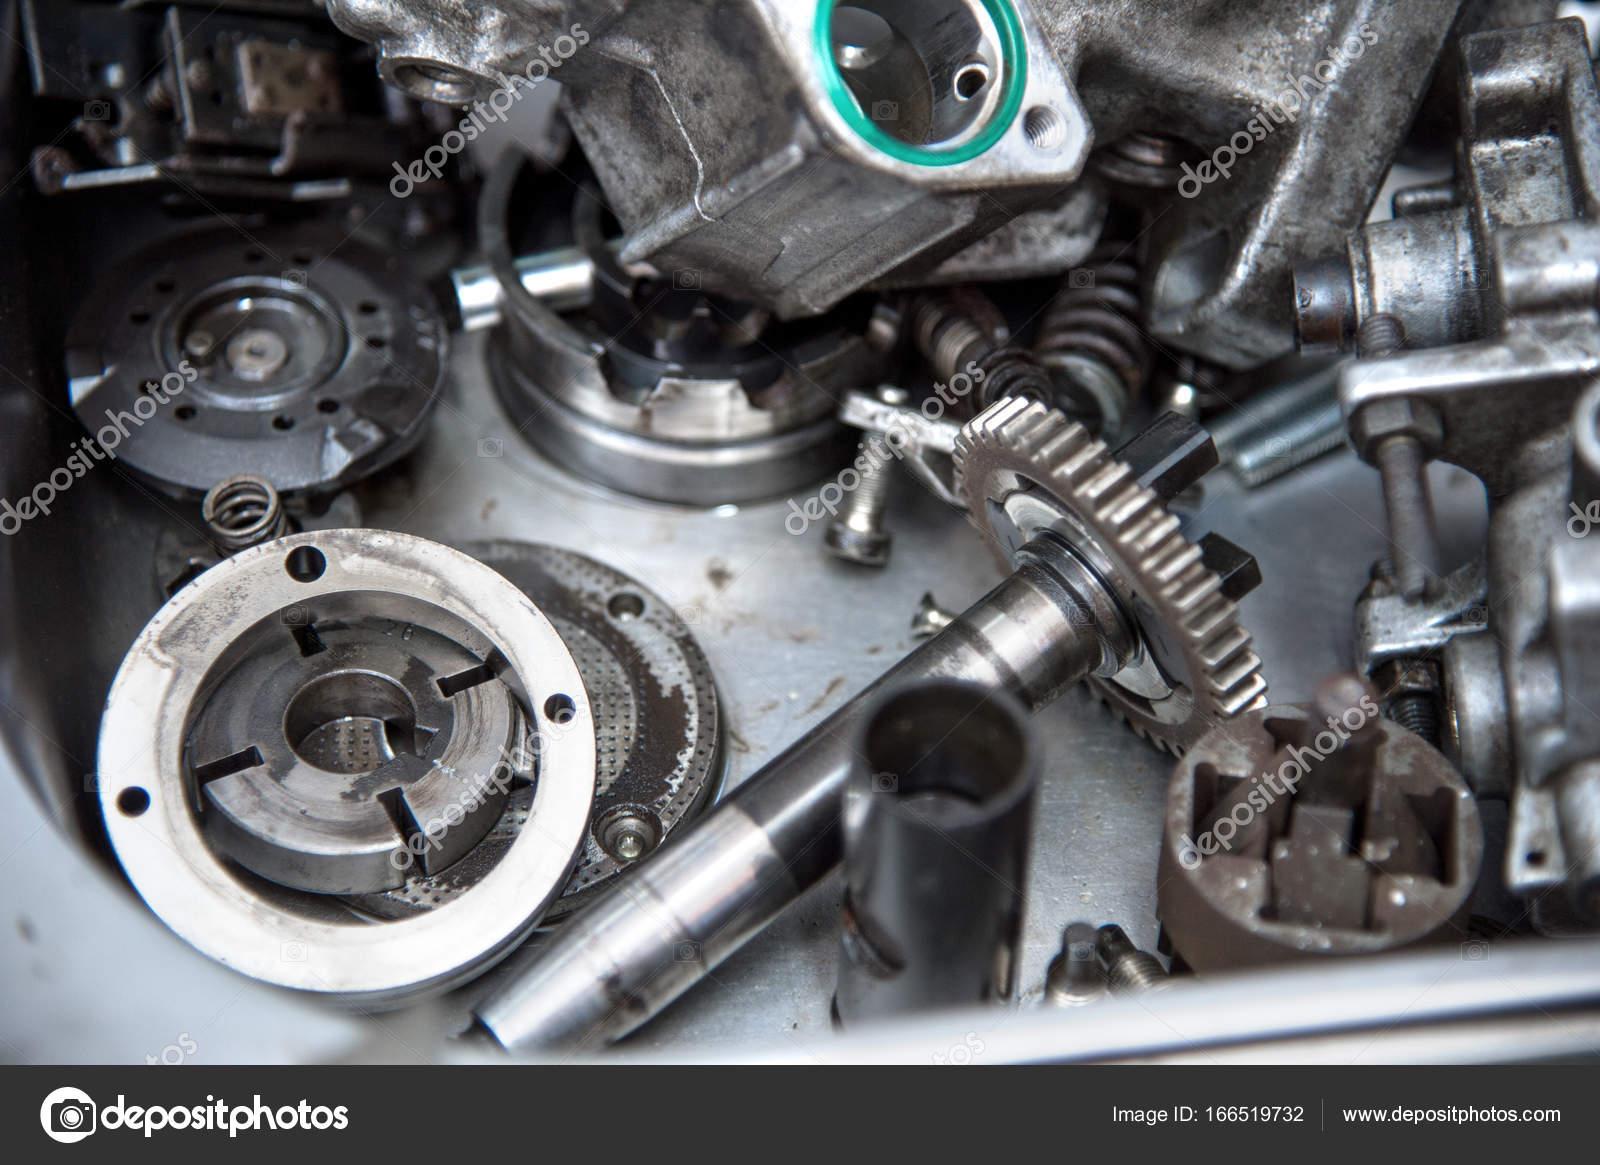 Disassembled mechanical high-pressure diesel pump